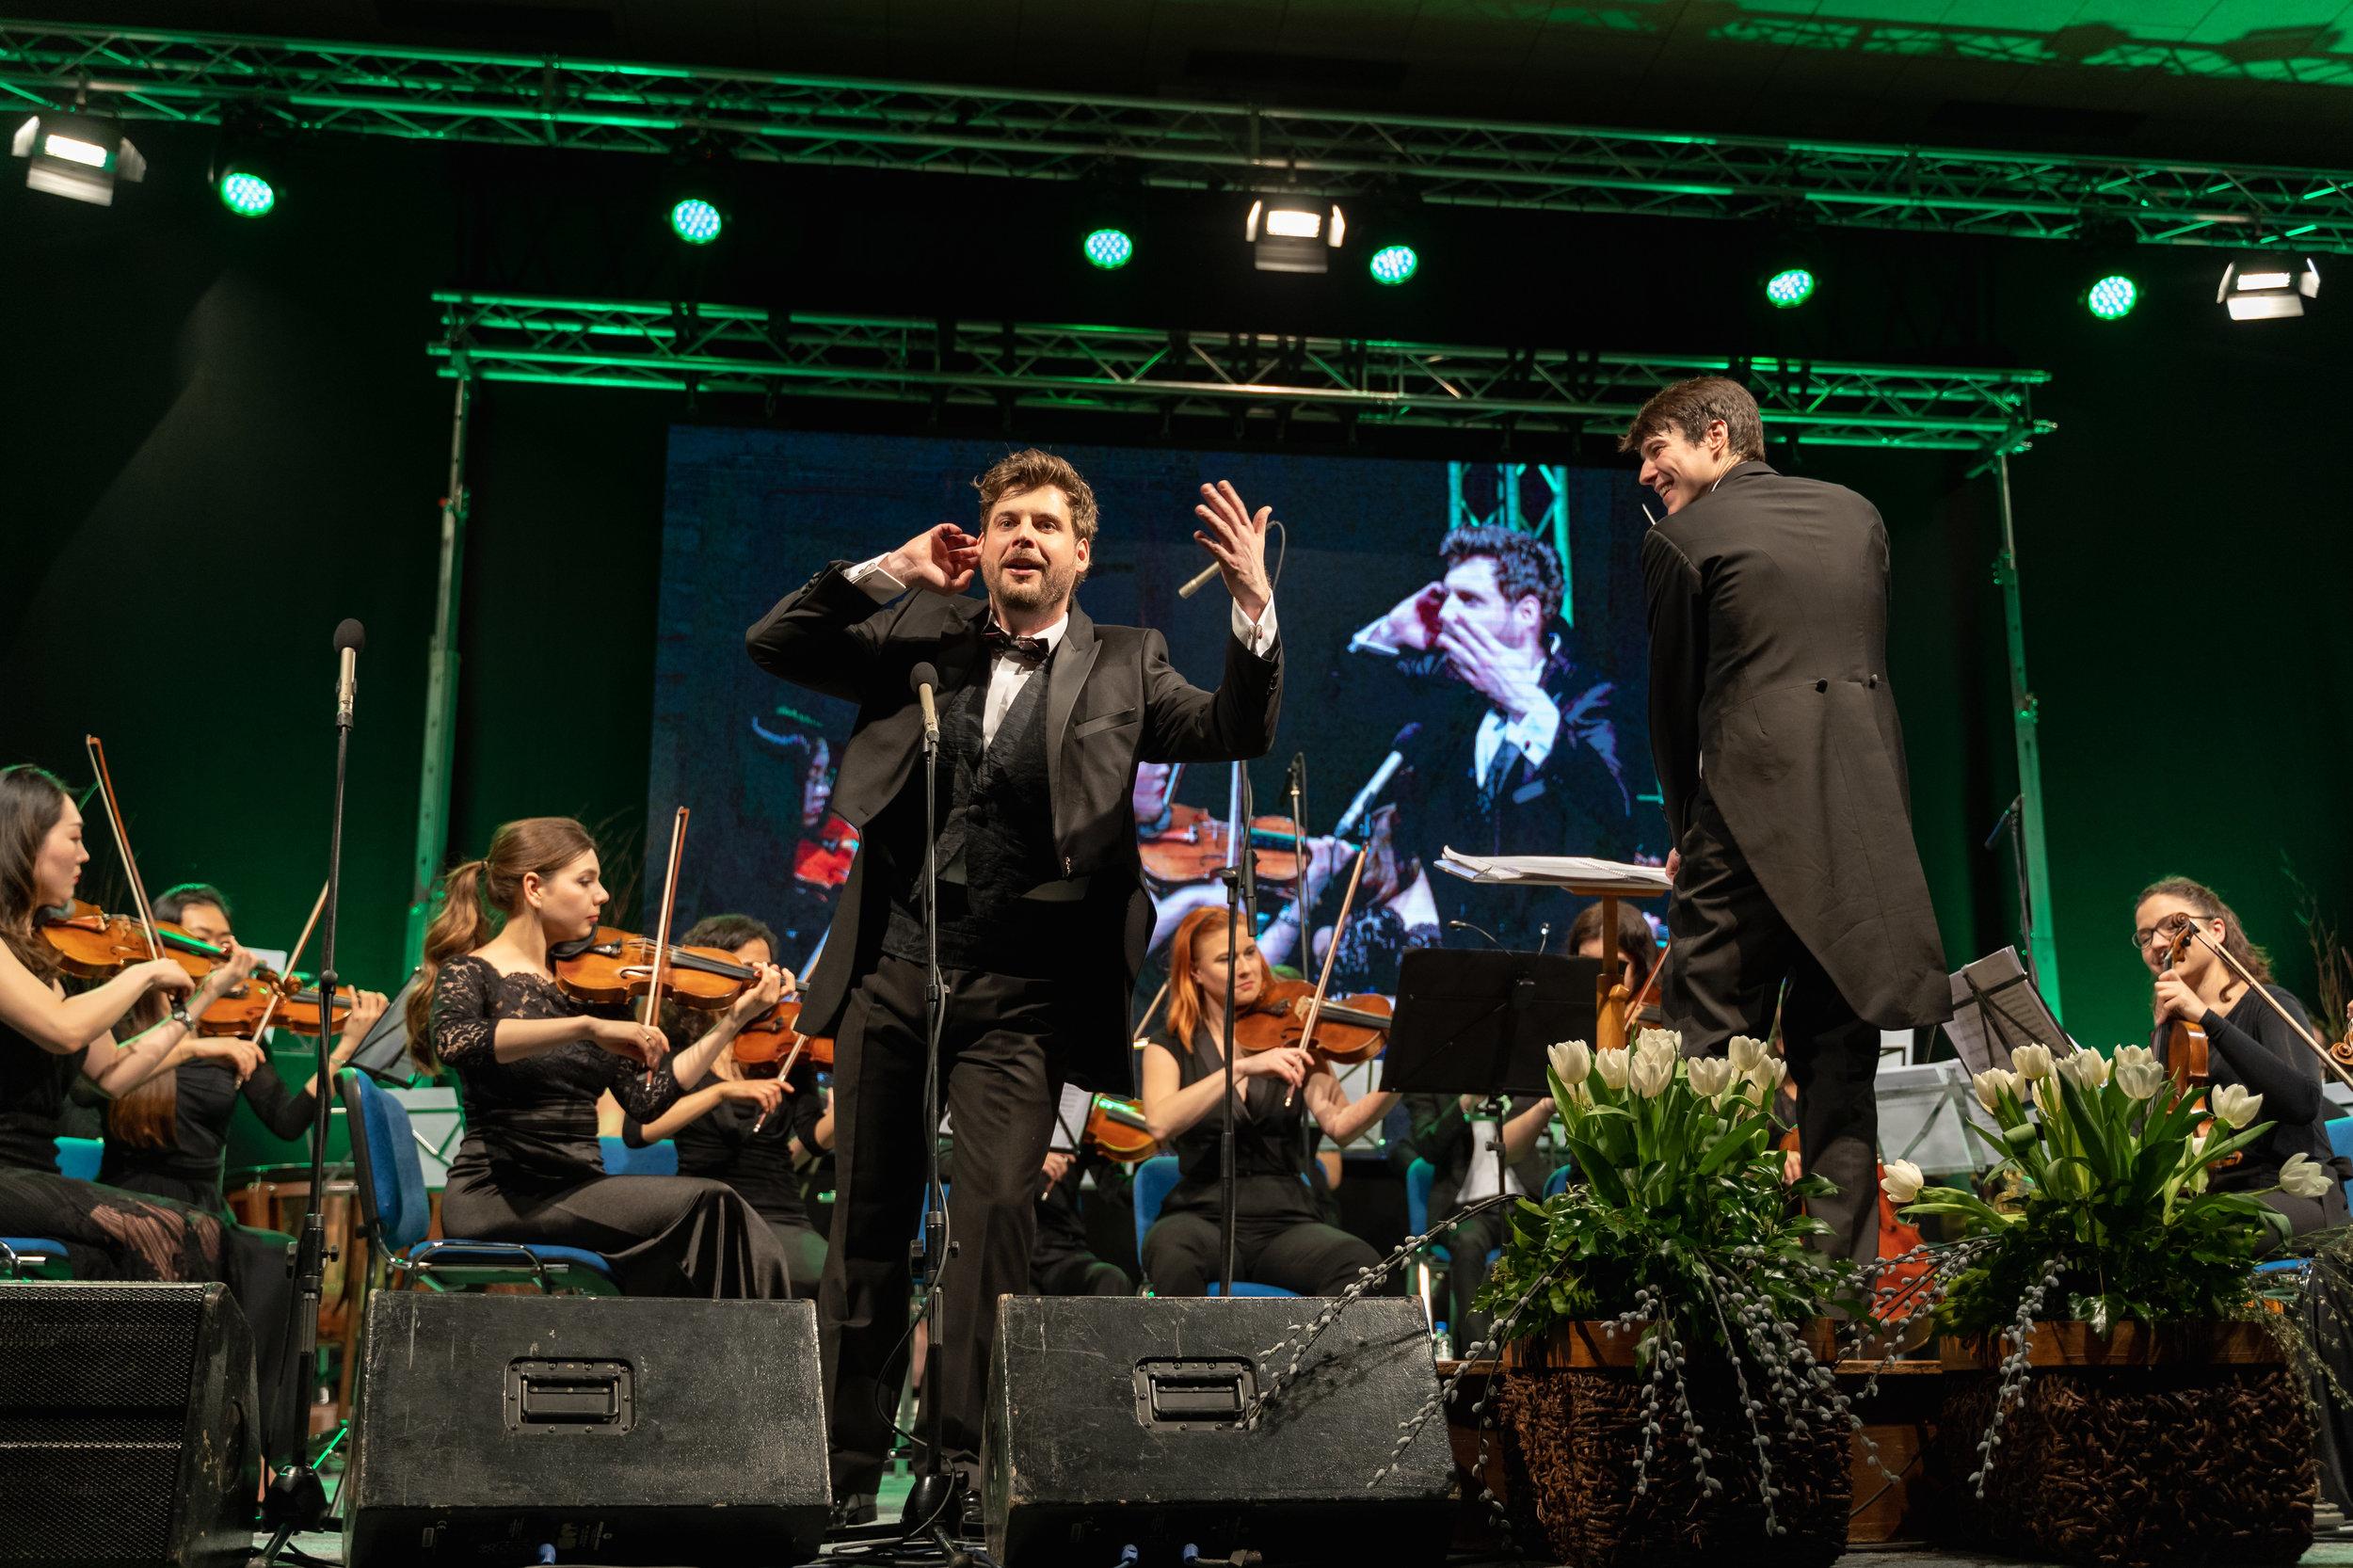 Singer Aljaž Vesel and conductor Andrej Vesel